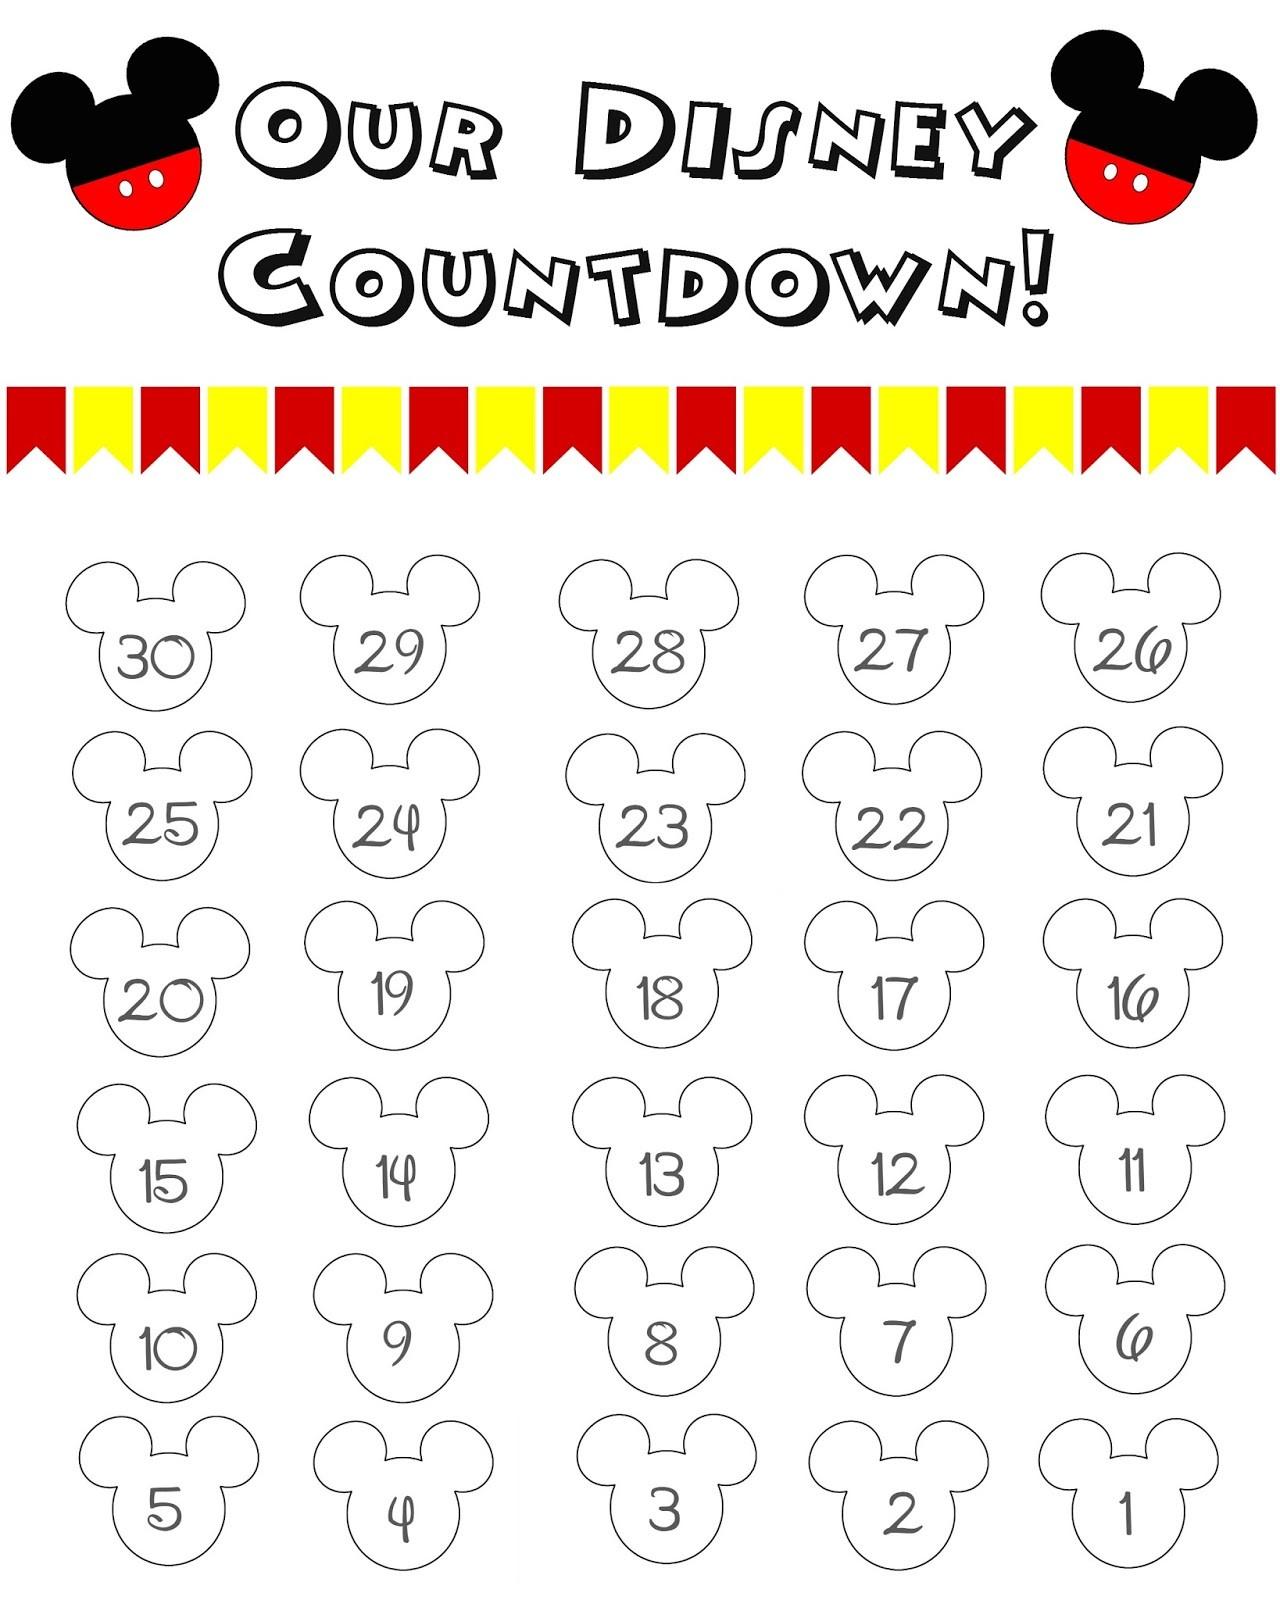 Disney World Countdown Calendar FREE Printable